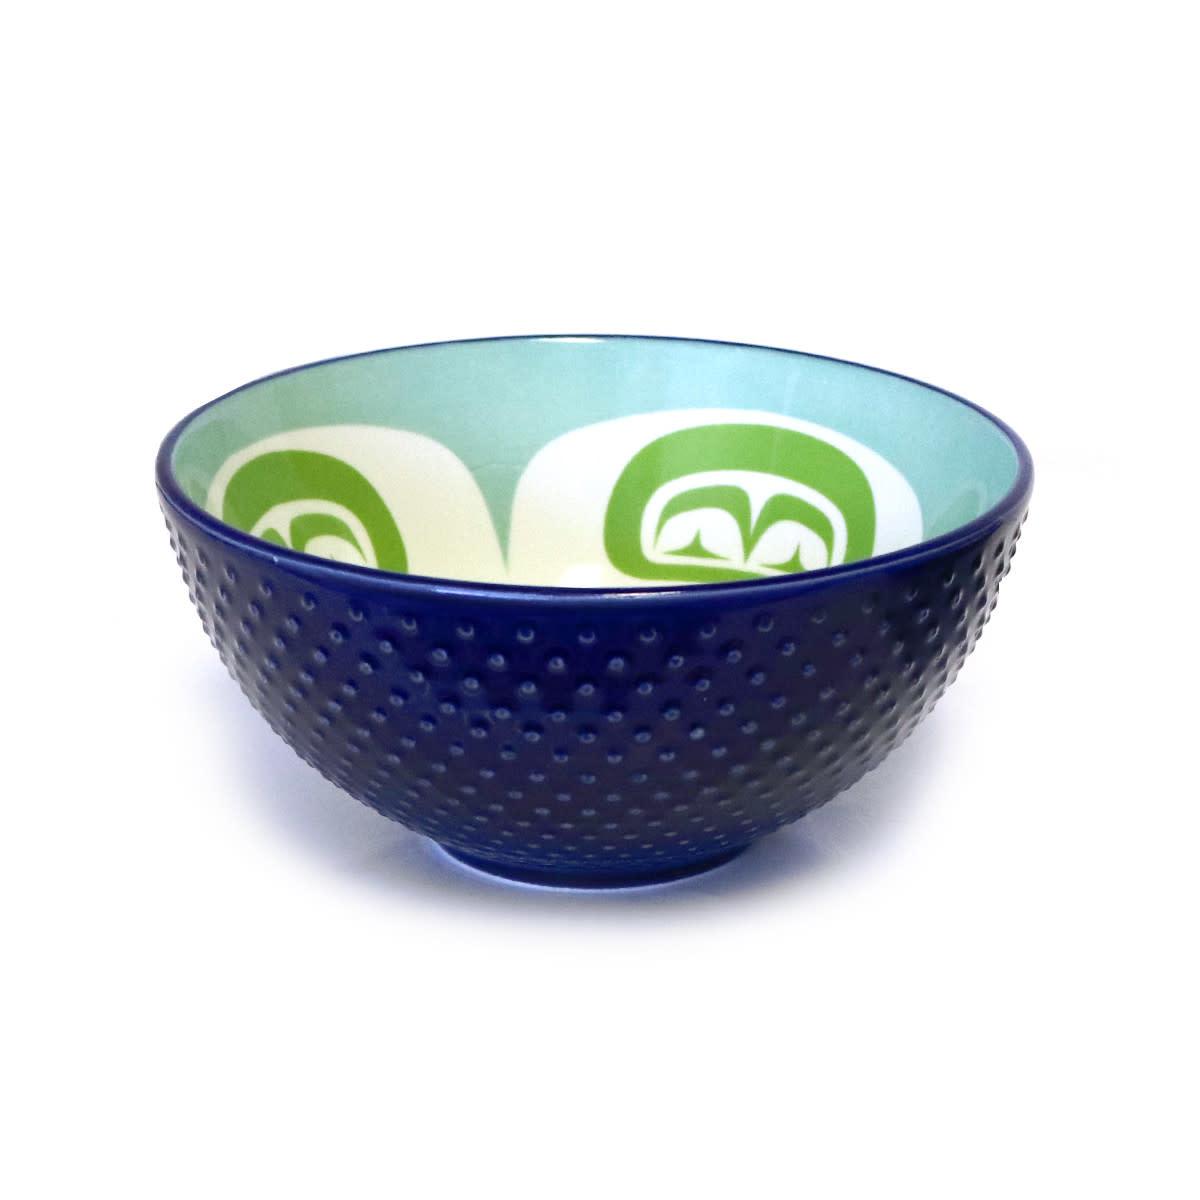 Porcelain Art Bowl